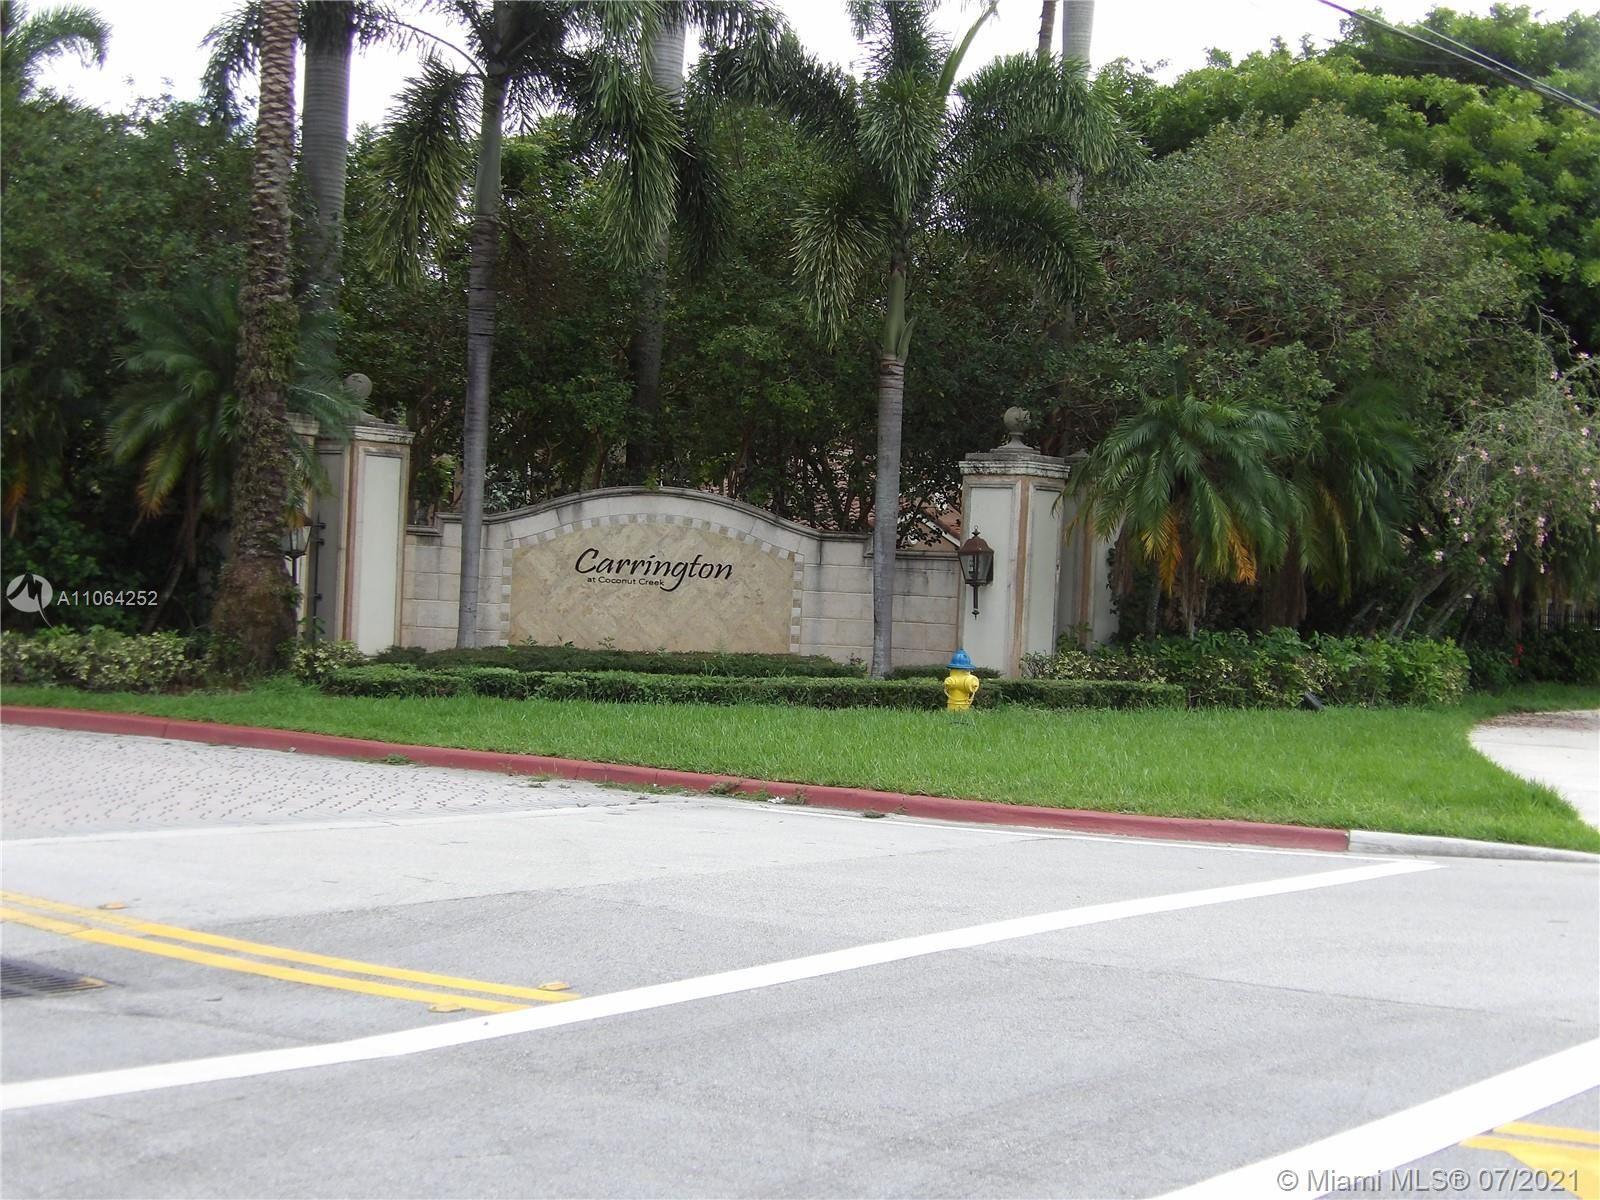 4848 N State Road 7 #4208, Coconut Creek, FL 33073 - #: A11064252